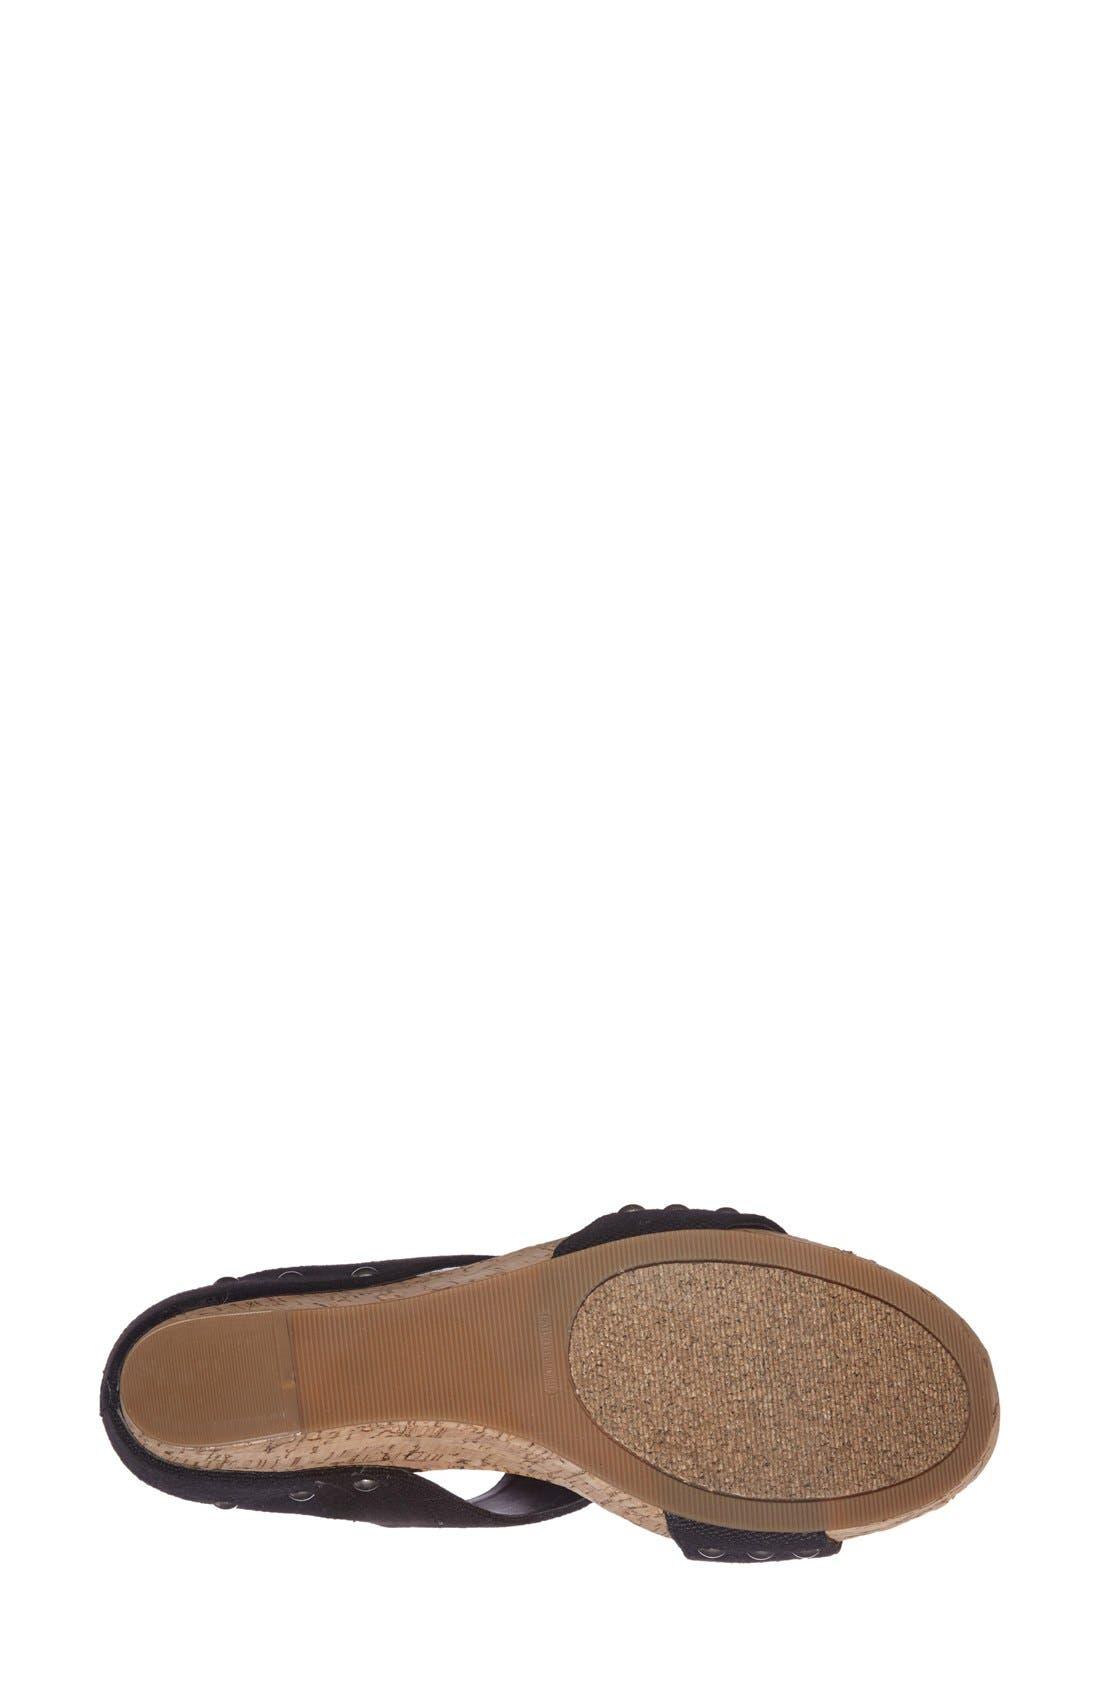 'Emilia 2' Wedge Sandal,                             Alternate thumbnail 4, color,                             Black